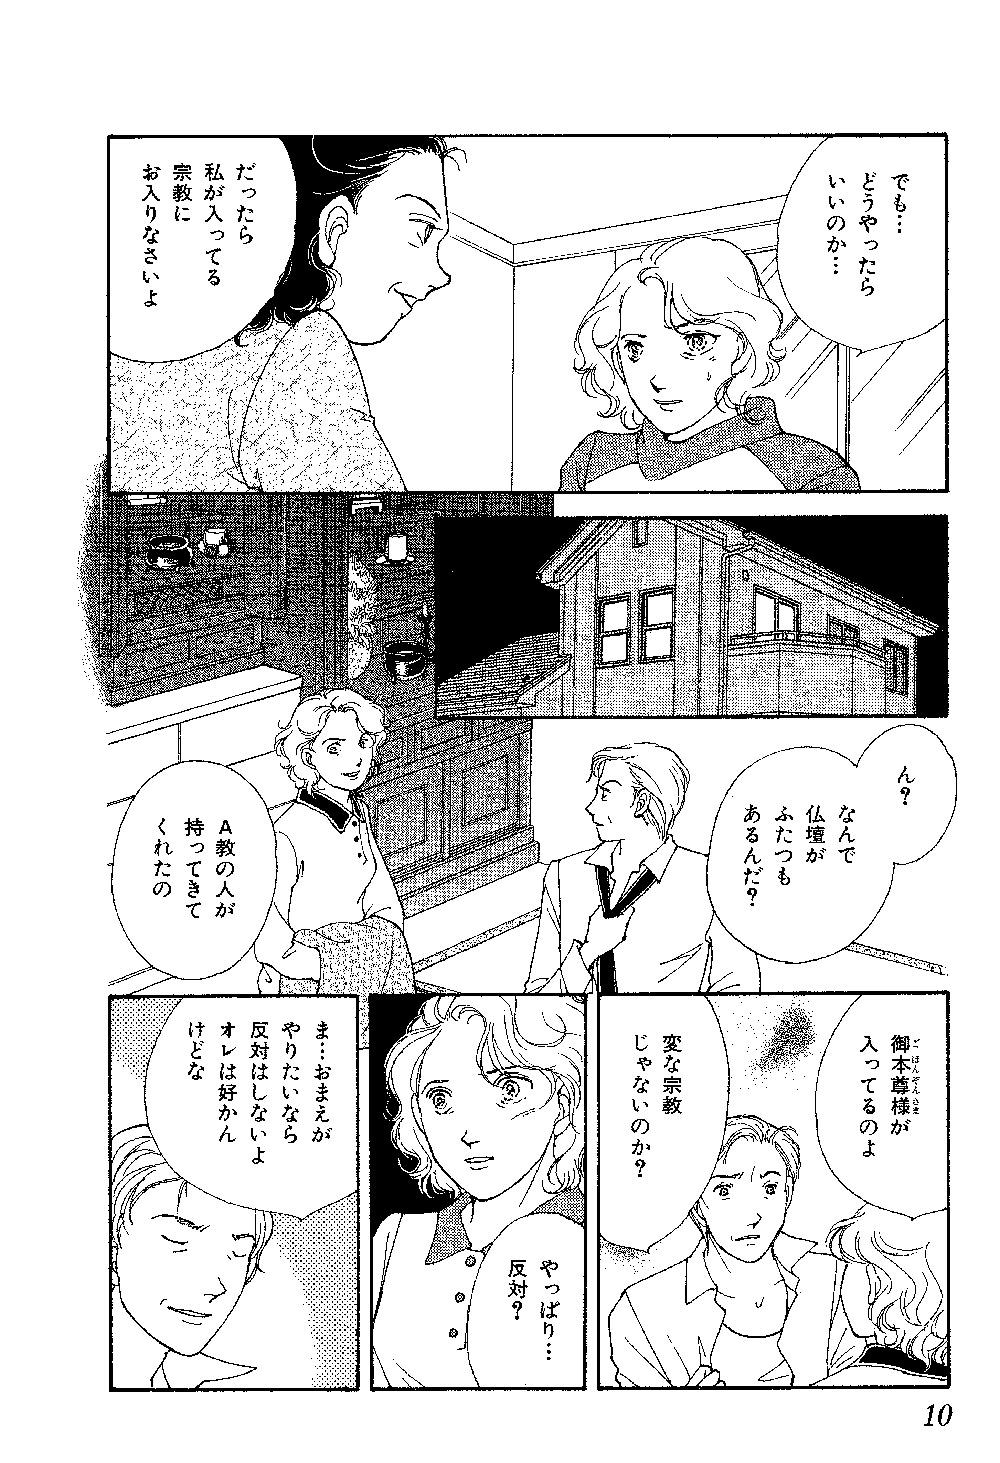 mayuri_0001_0010.jpg